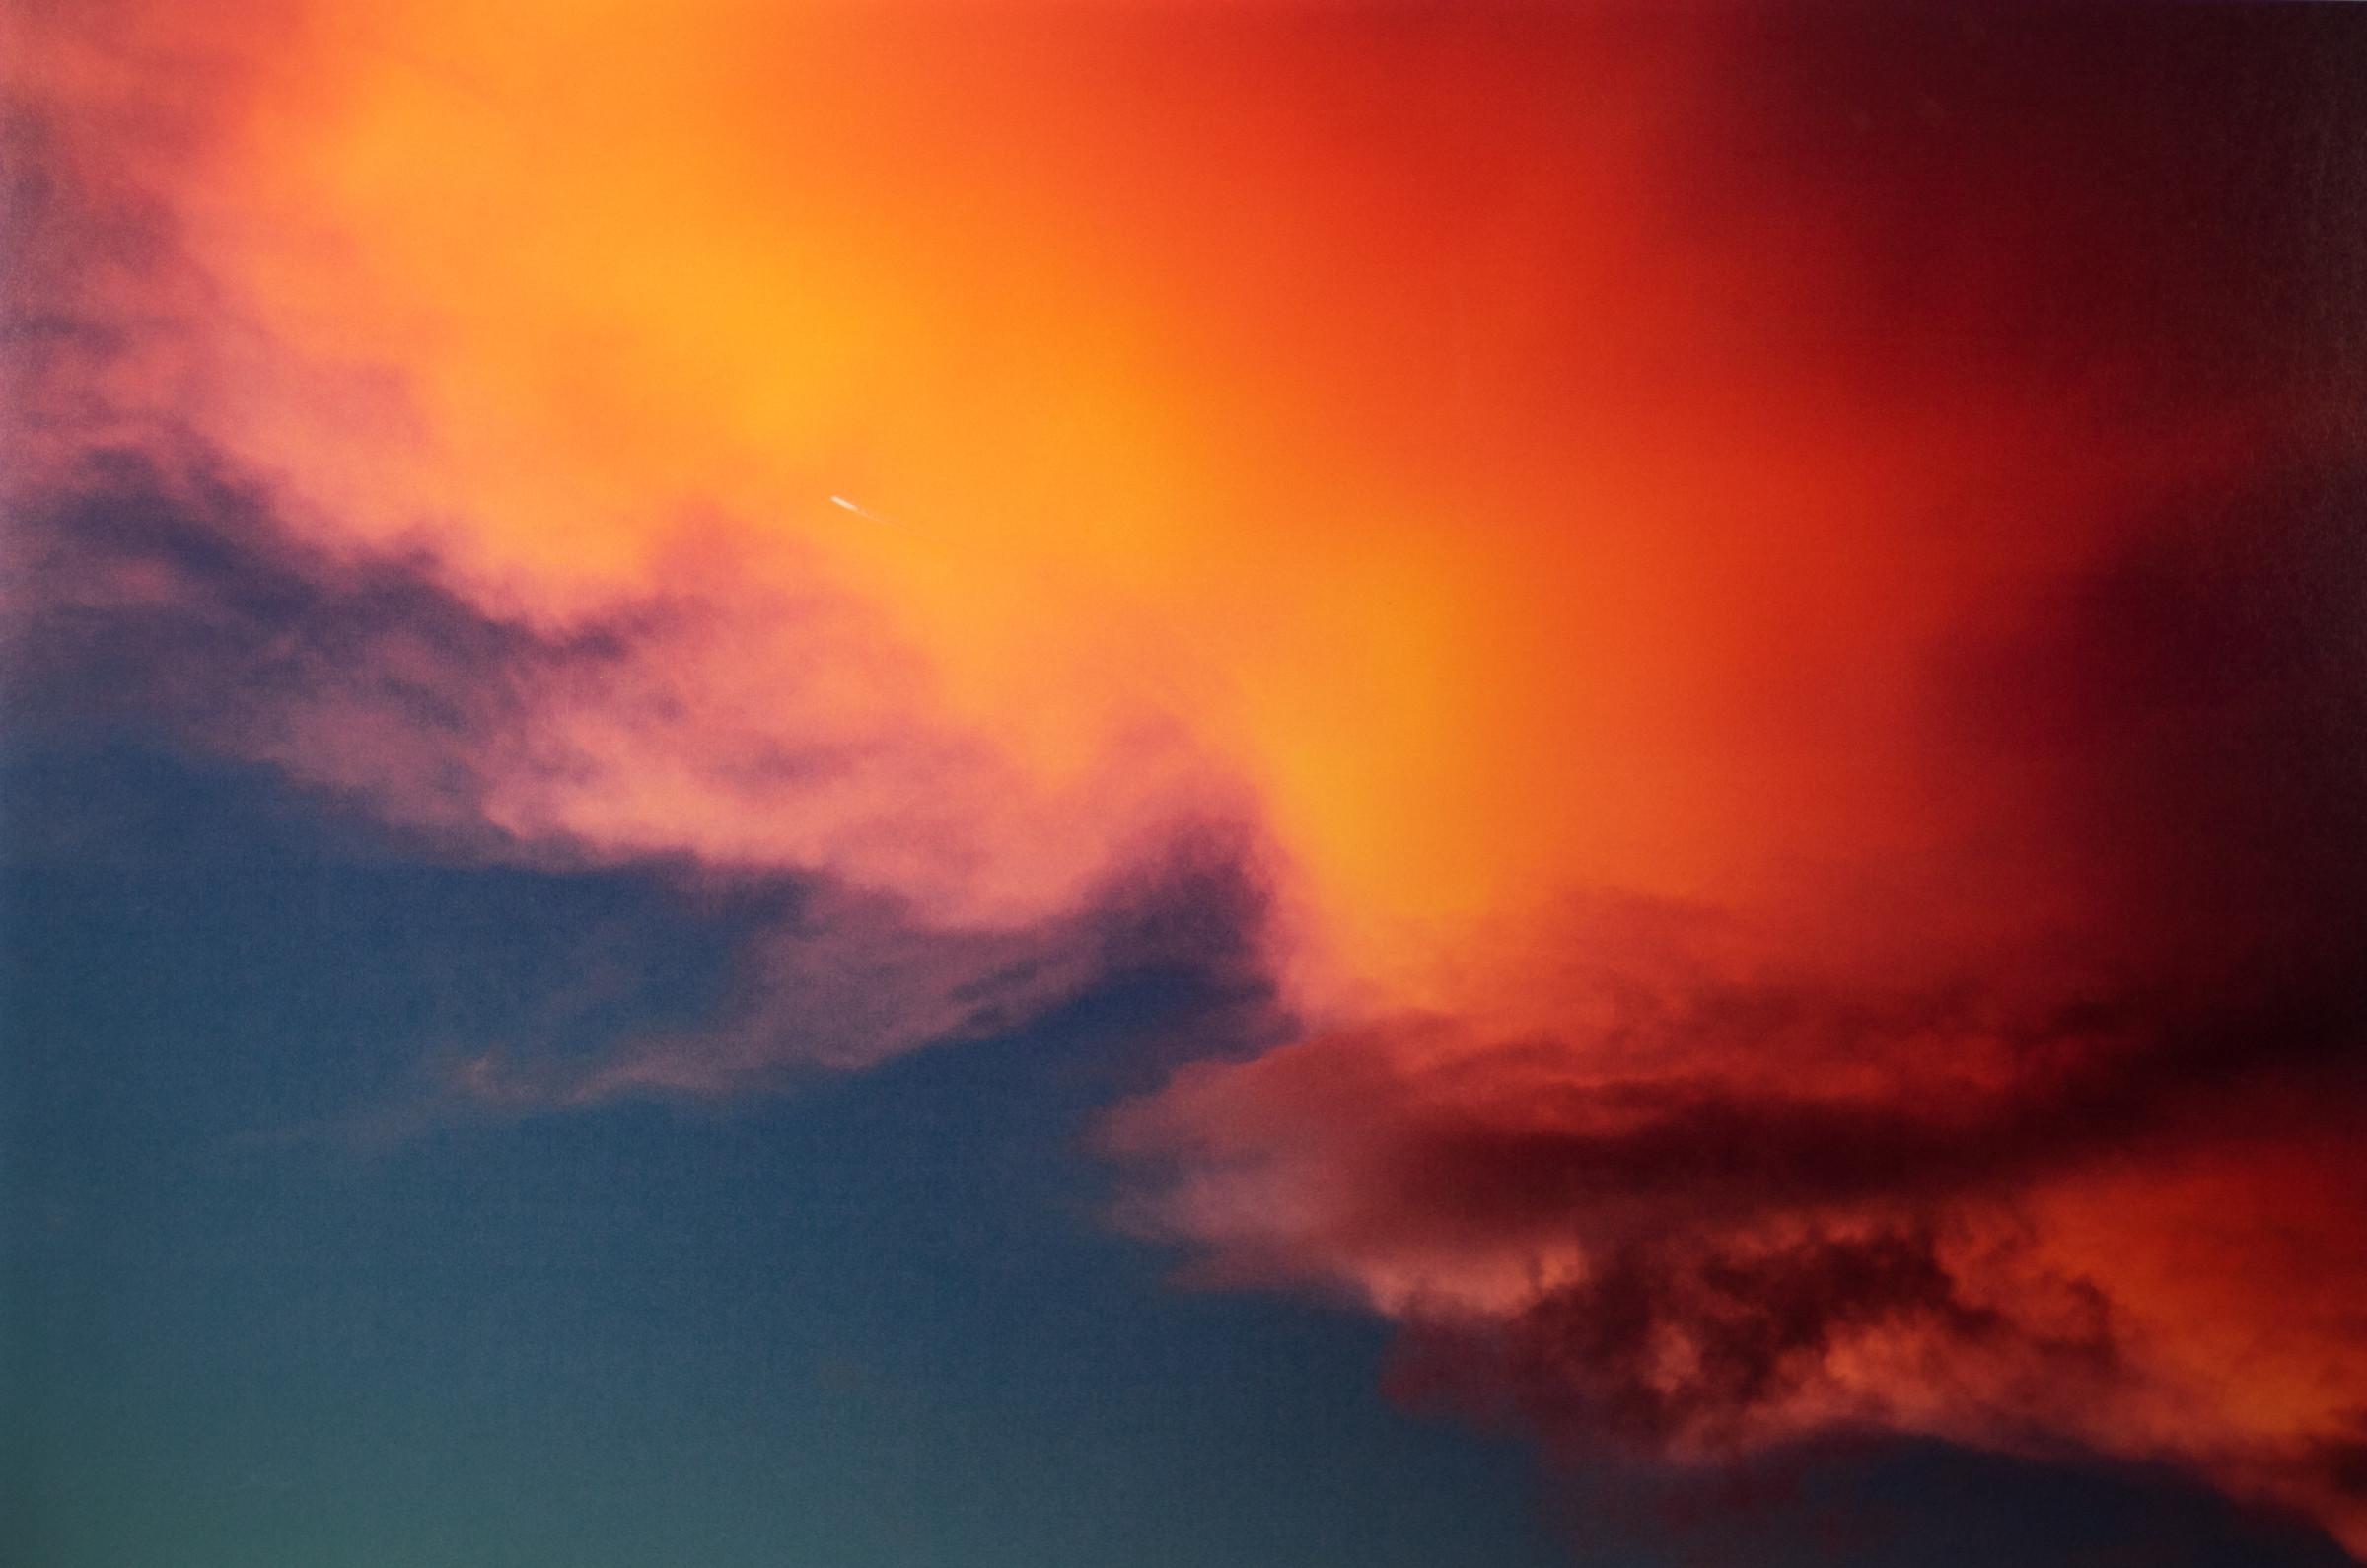 <span class=&#34;link fancybox-details-link&#34;><a href=&#34;/artworks/173-lionel-gasperini-pink-cloud-2014/&#34;>View Detail Page</a></span><div class=&#34;artist&#34;><strong>Lionel Gasperini</strong></div> <div class=&#34;title&#34;><em>Pink Cloud</em>, 2014</div> <div class=&#34;medium&#34;>Print on Foamboard</div> <div class=&#34;dimensions&#34;>31 x 43 inches</div> <div class=&#34;edition_details&#34;>30</div>